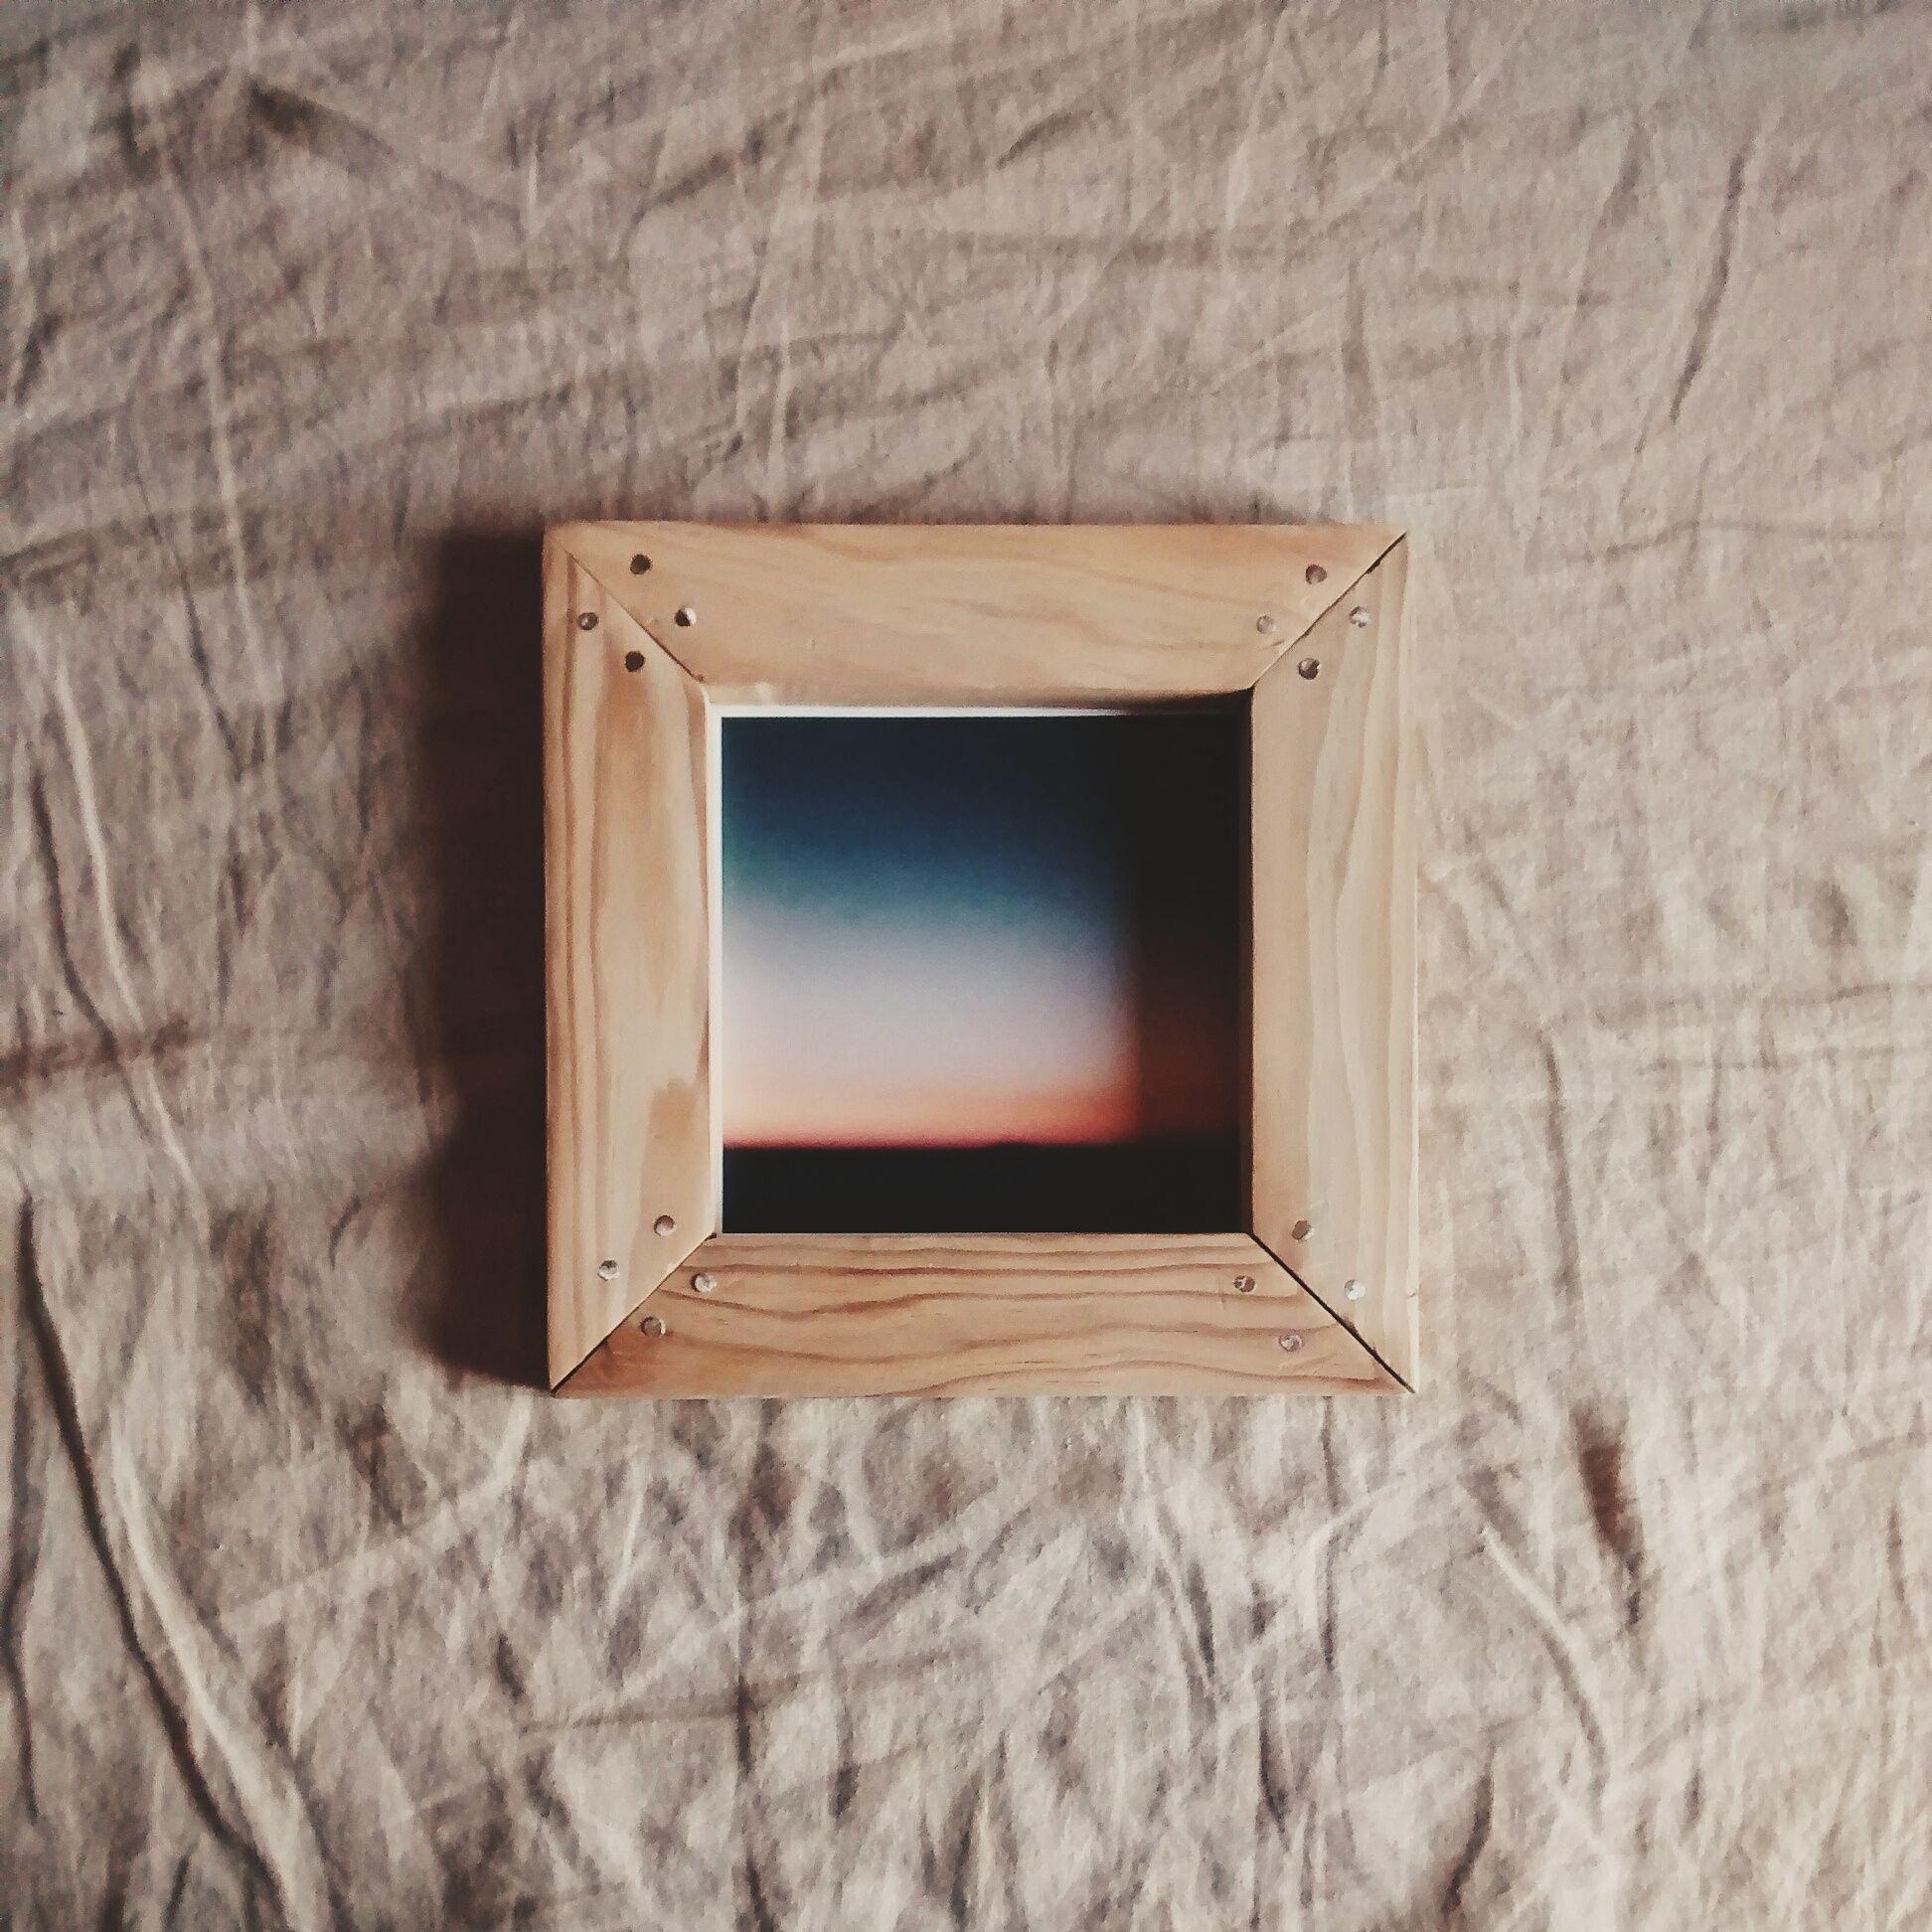 Marco madera palets inglete reciclar marcos marcos madera y palets Marcos fotos madera